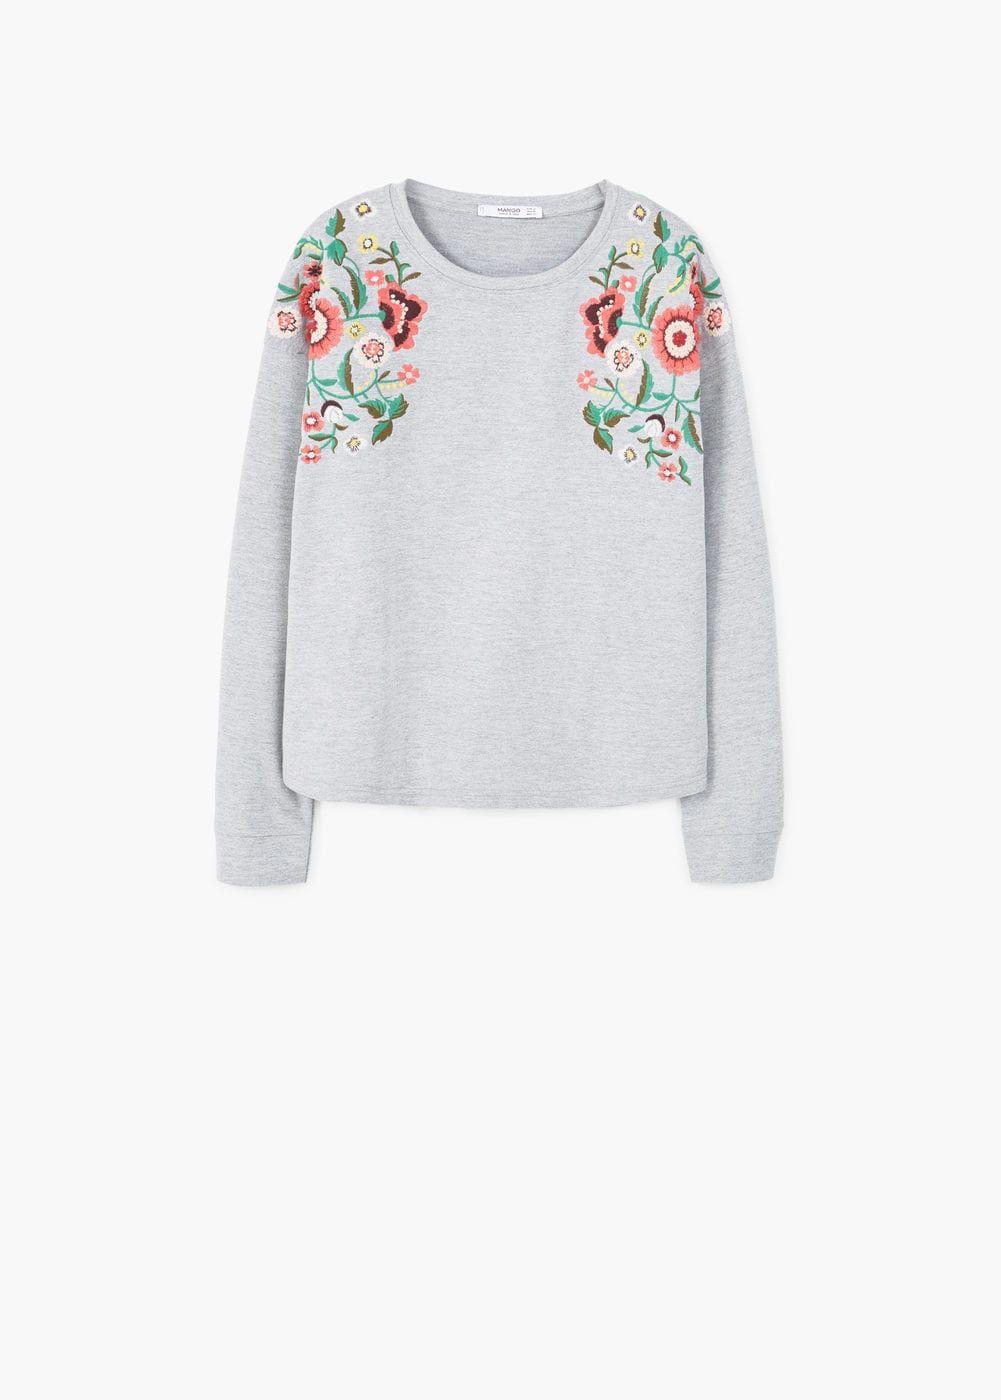 Floral embroidered sweatshirt | MANGO